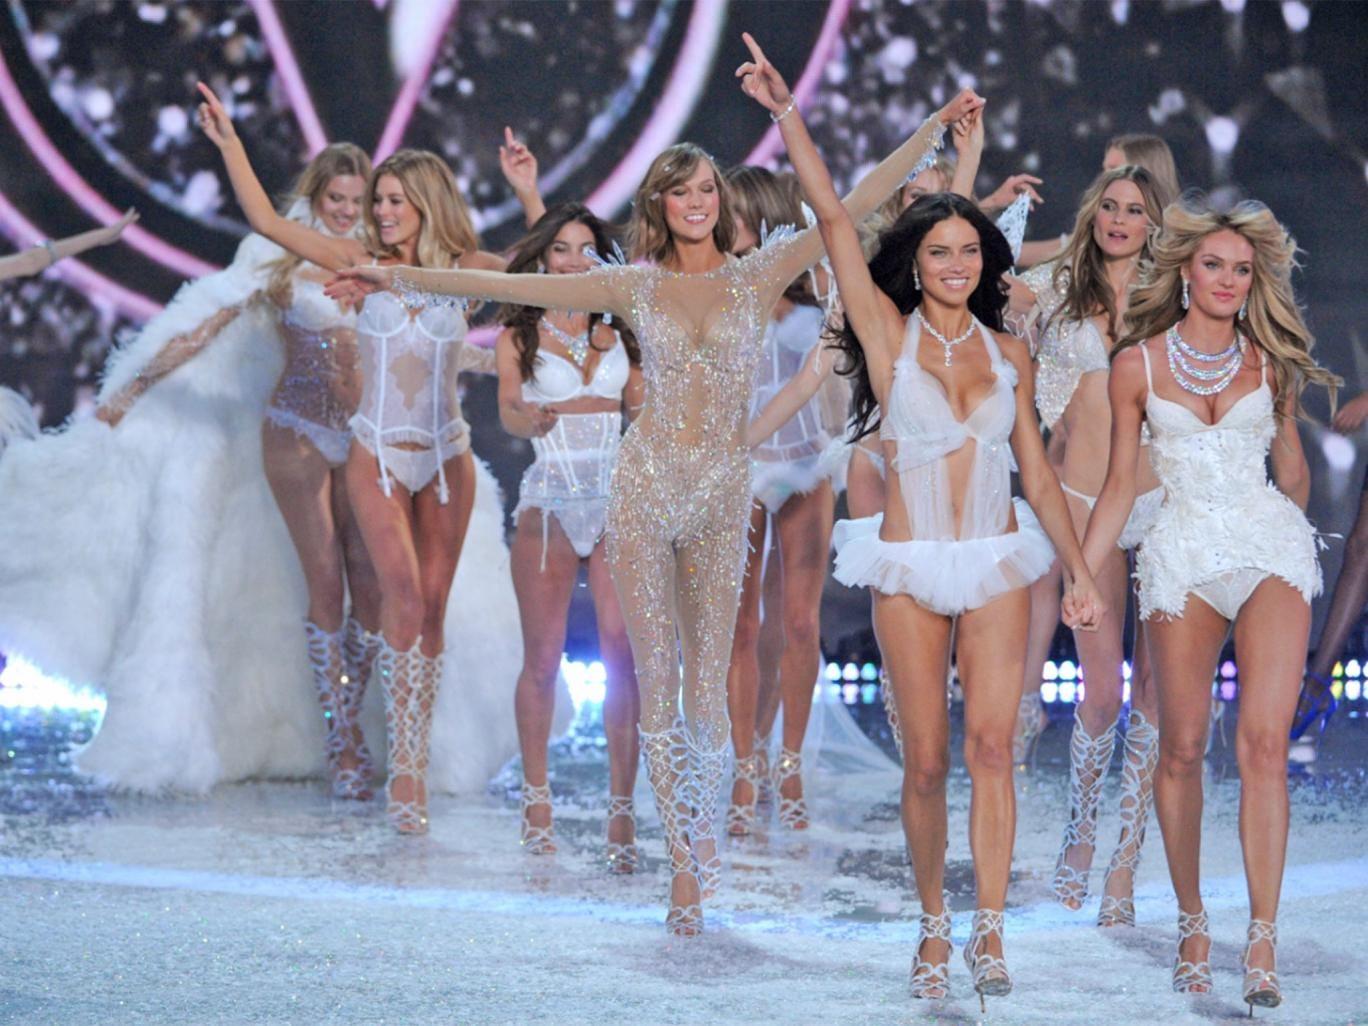 Rafa Nunez: Environment, Community and Inclusion at Victoria's Secret